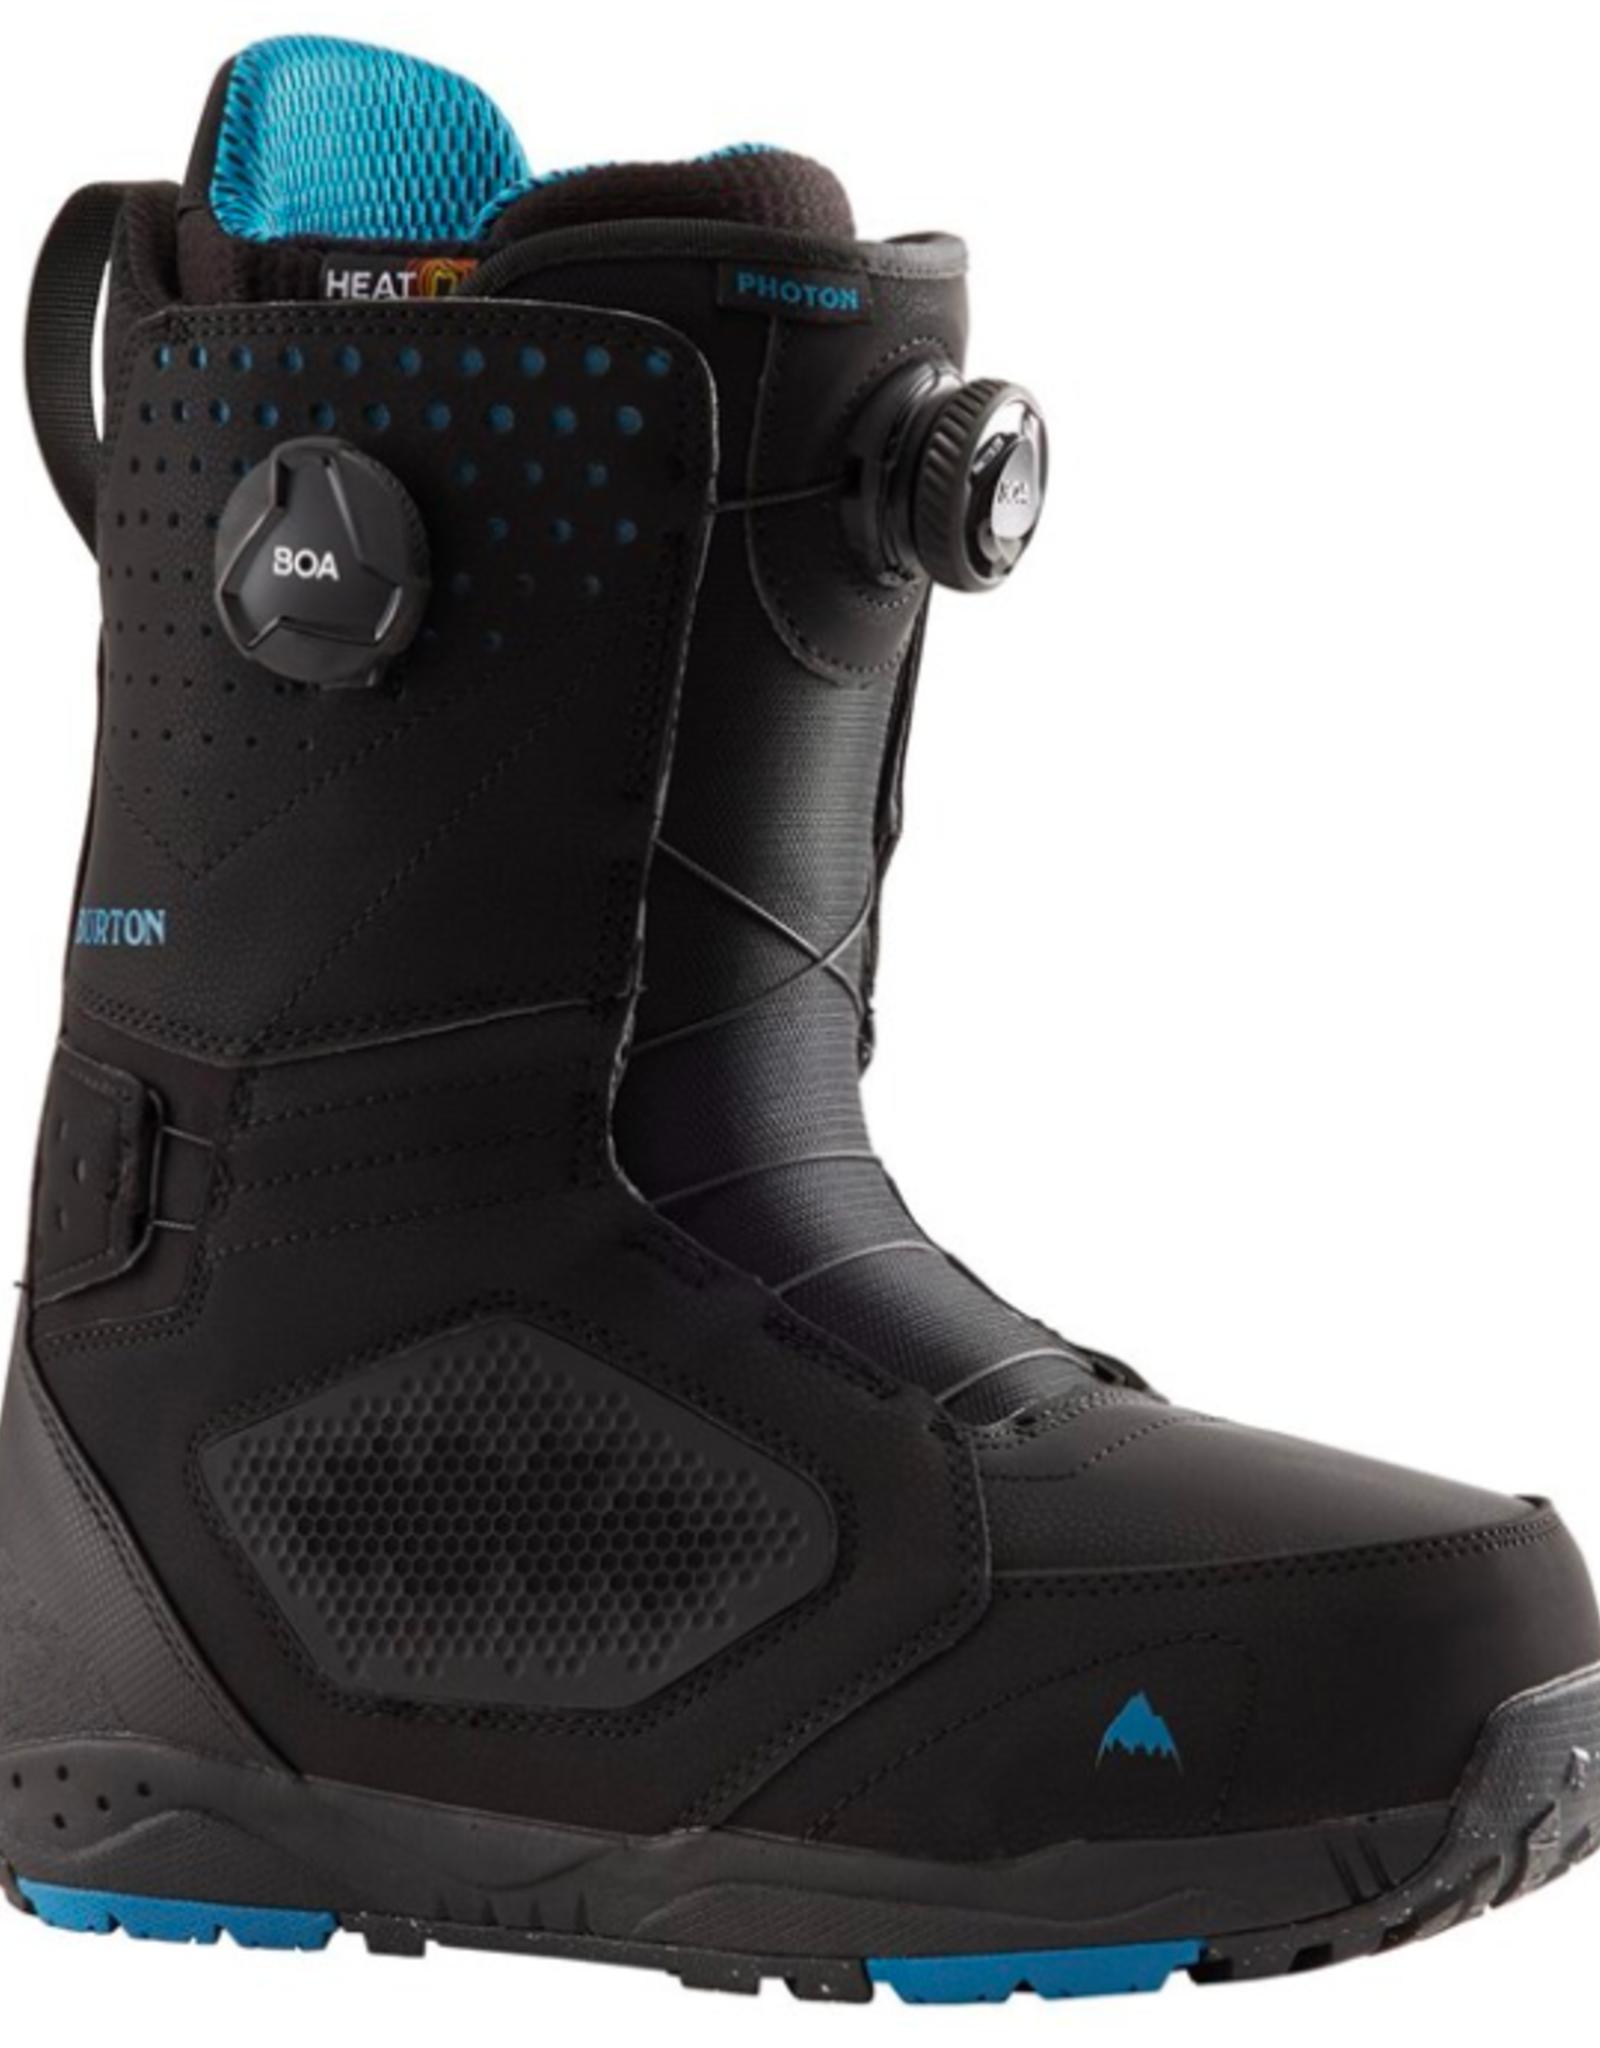 BURTON Burton Men's Photon Boa Wide Snowboard Boots Black 2022